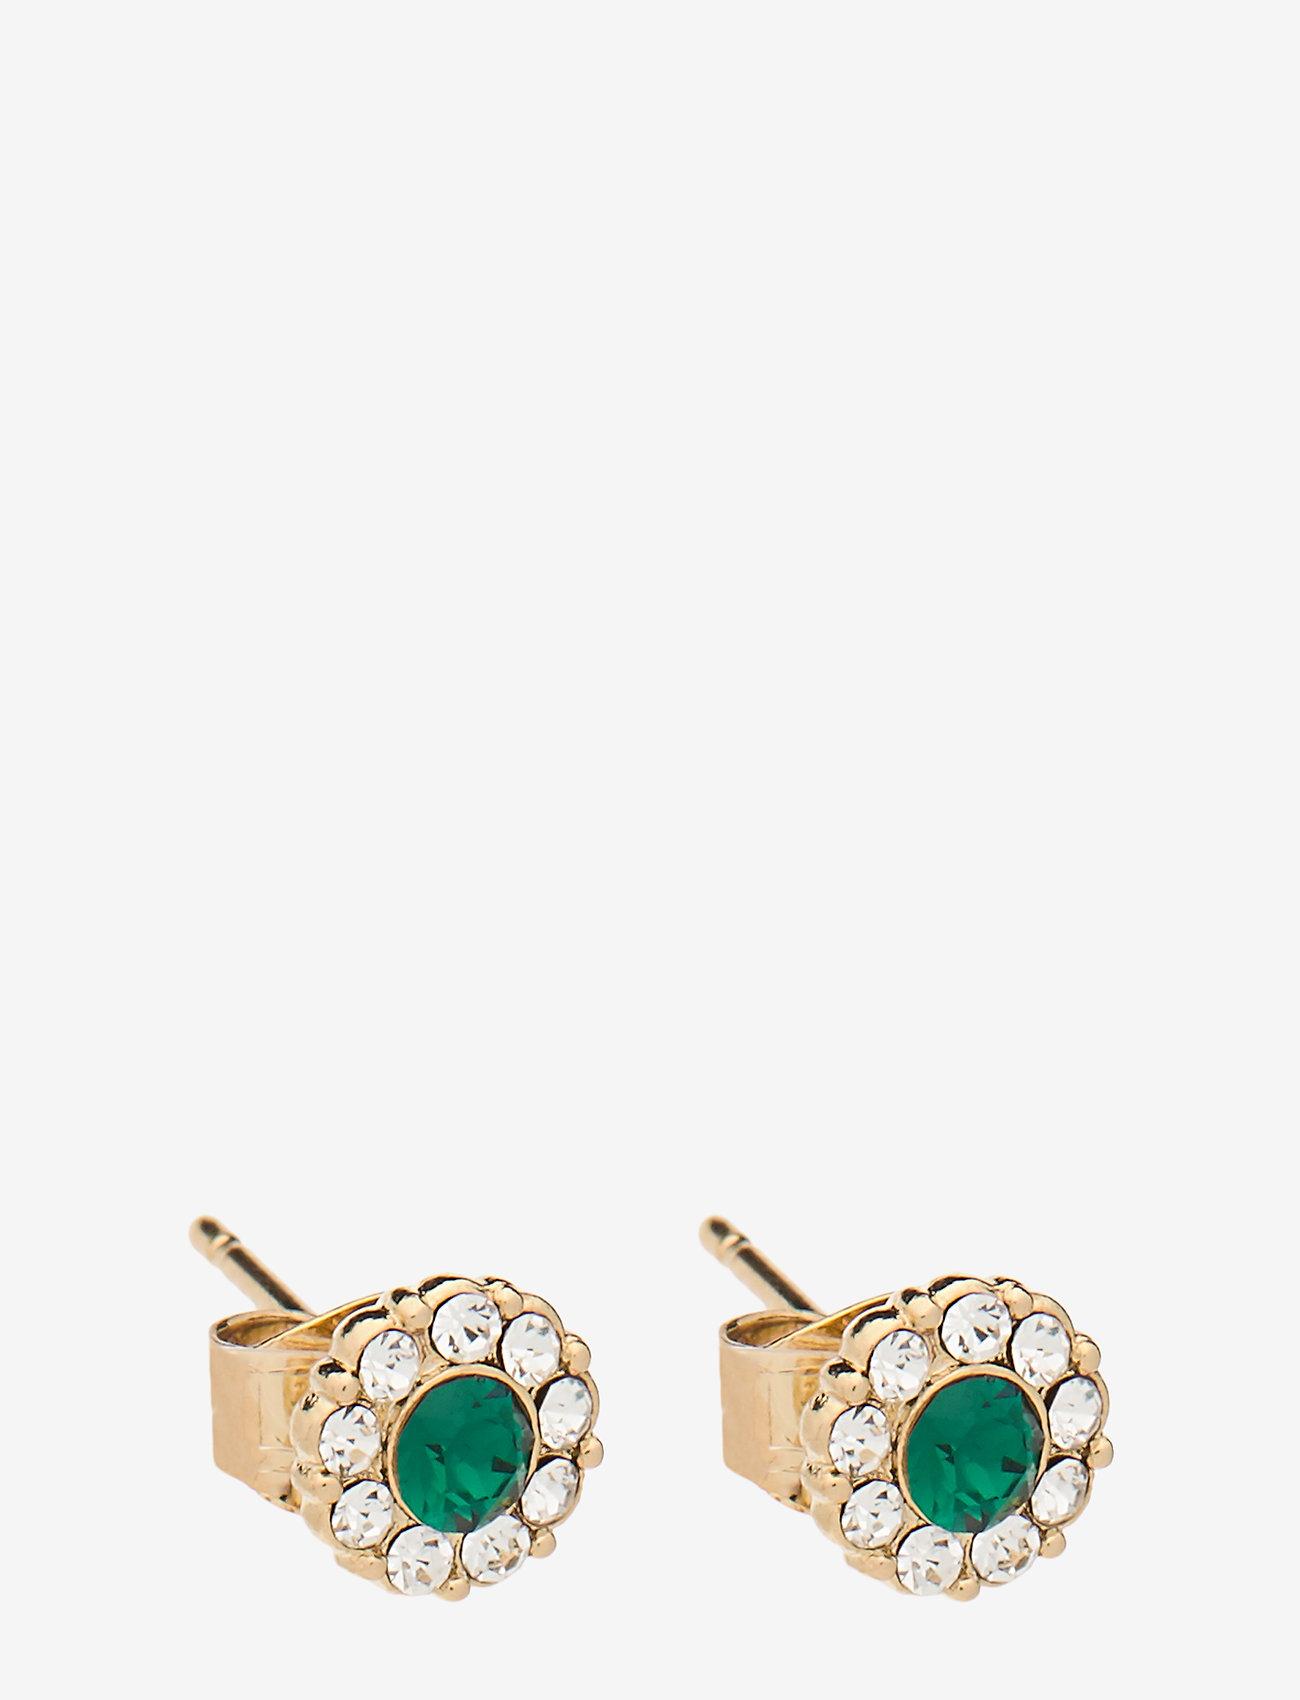 LILY AND ROSE - Petite Miss Sofia earrings - Emerald - nappikorvakorut - emerald